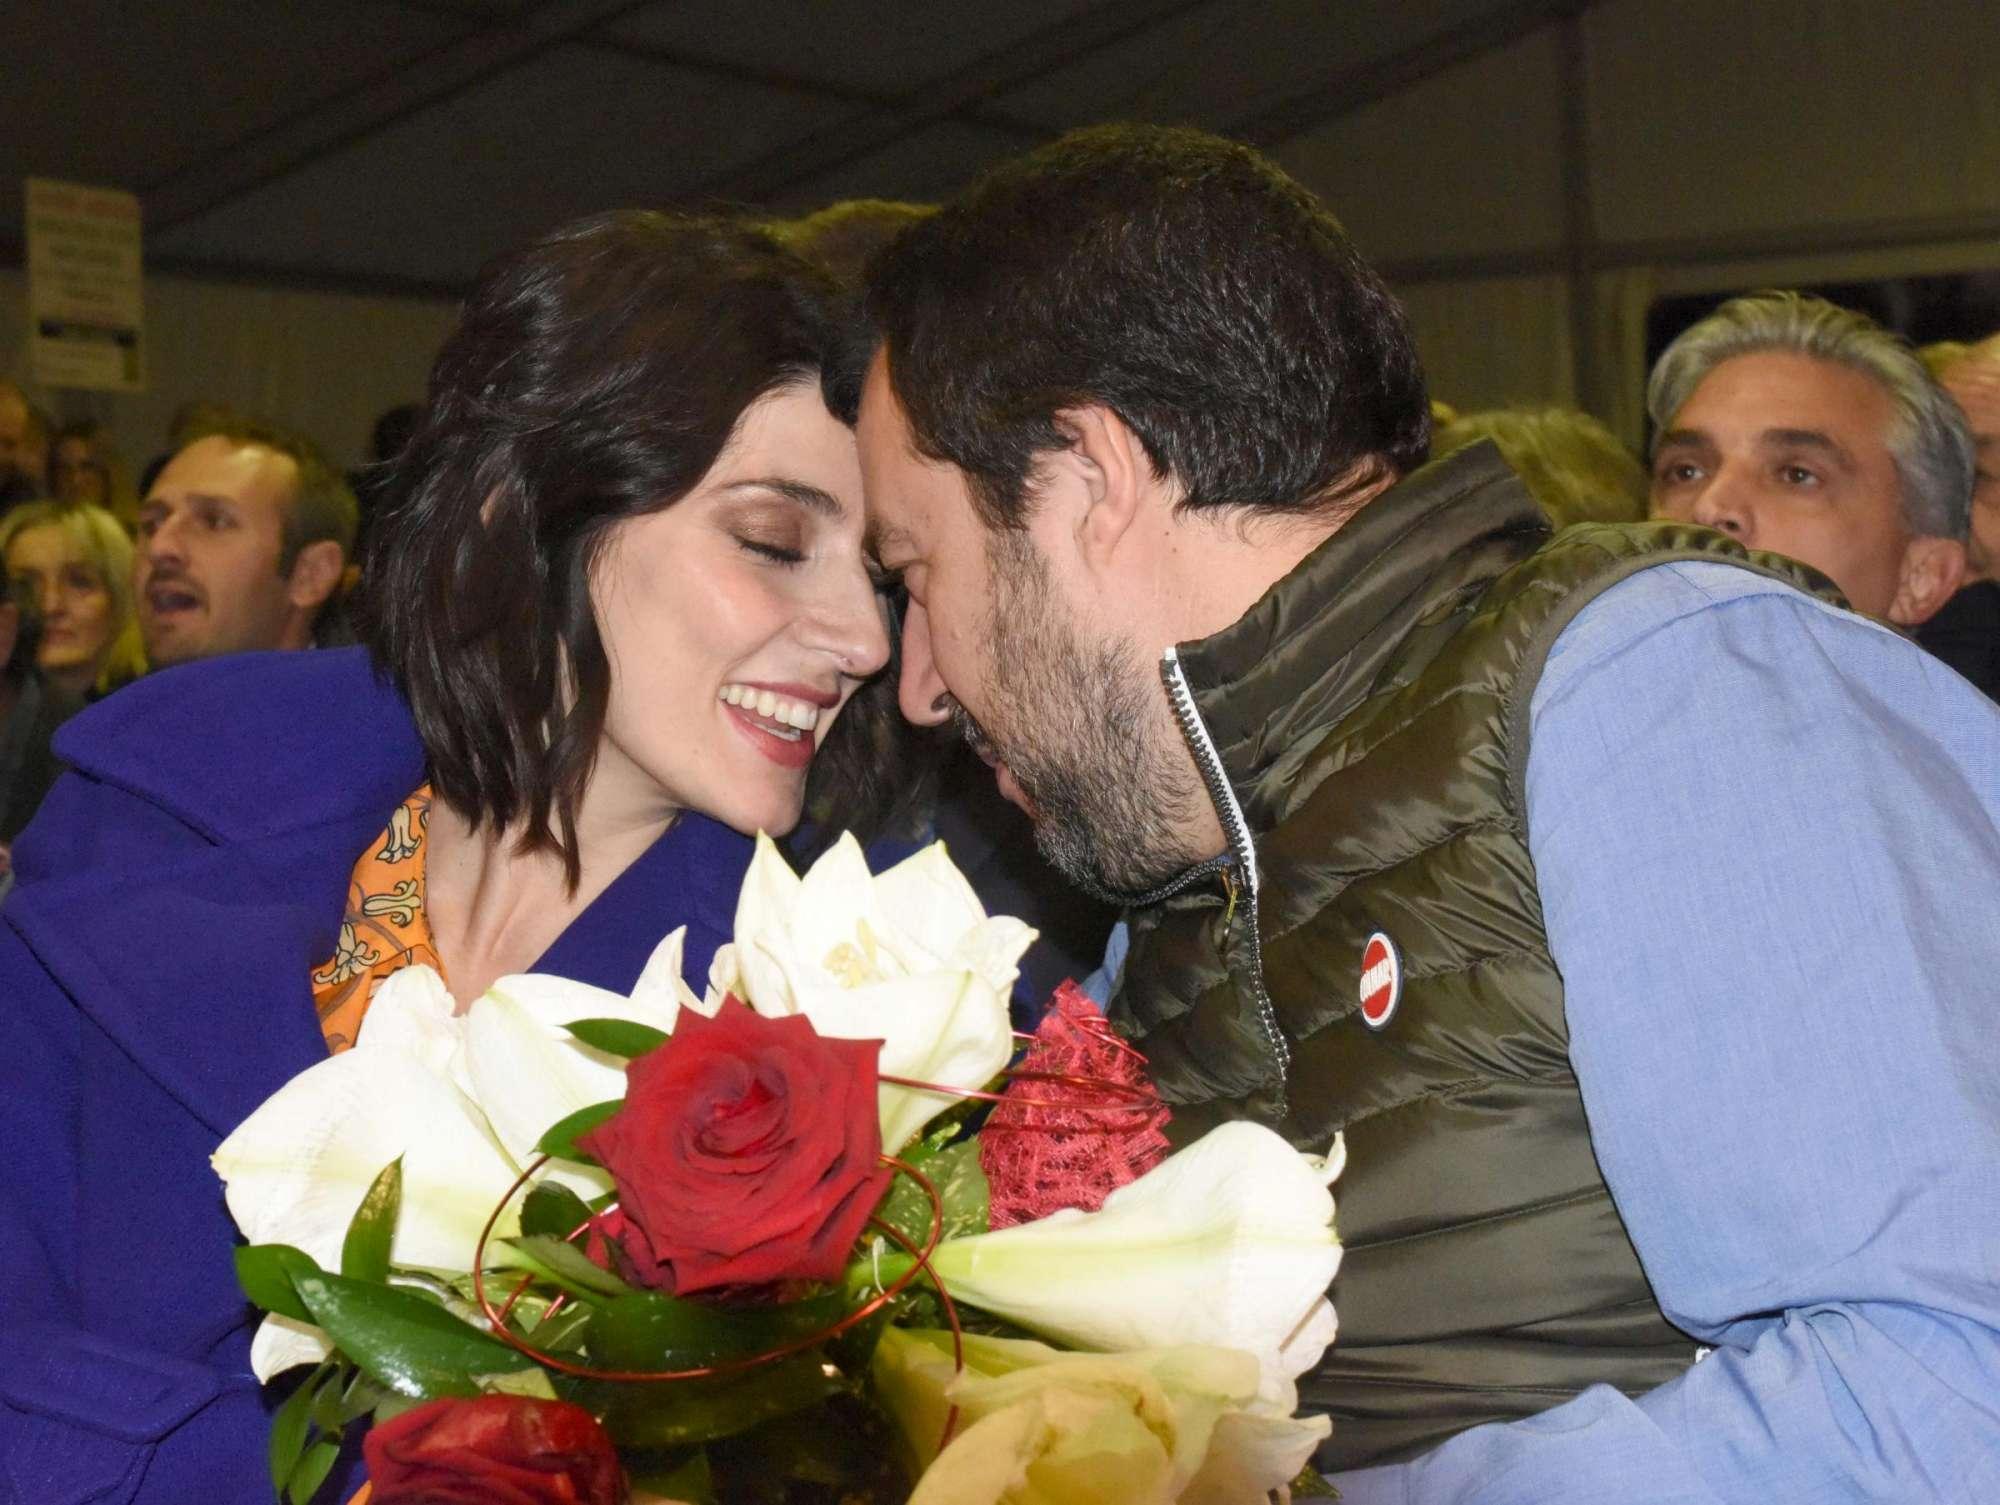 Matteo Salvini ed Elisa Isoardi, baci intensi alla Fiera del porro